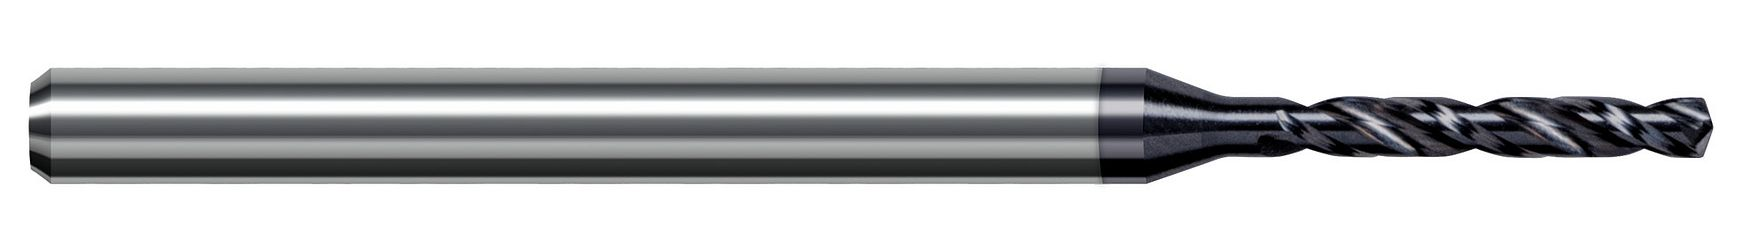 tool-details-BGN0225-C6